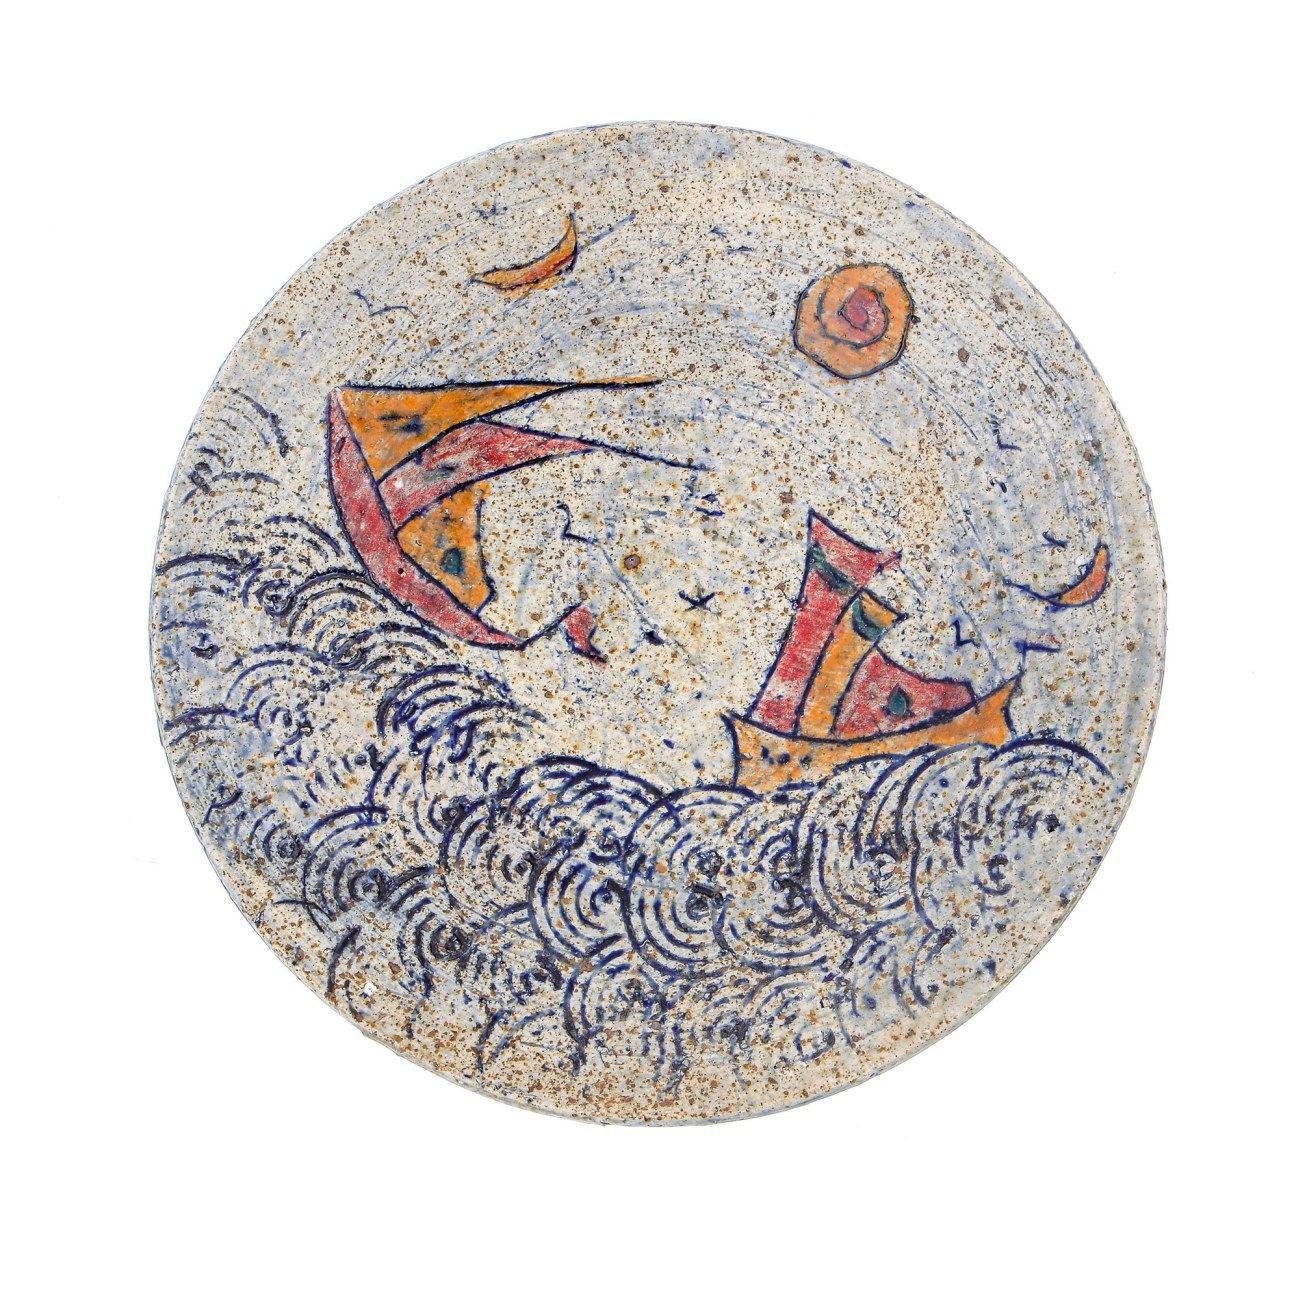 Decorative Plate Handmade Ceramic Table Or Wall Art Decor Sea